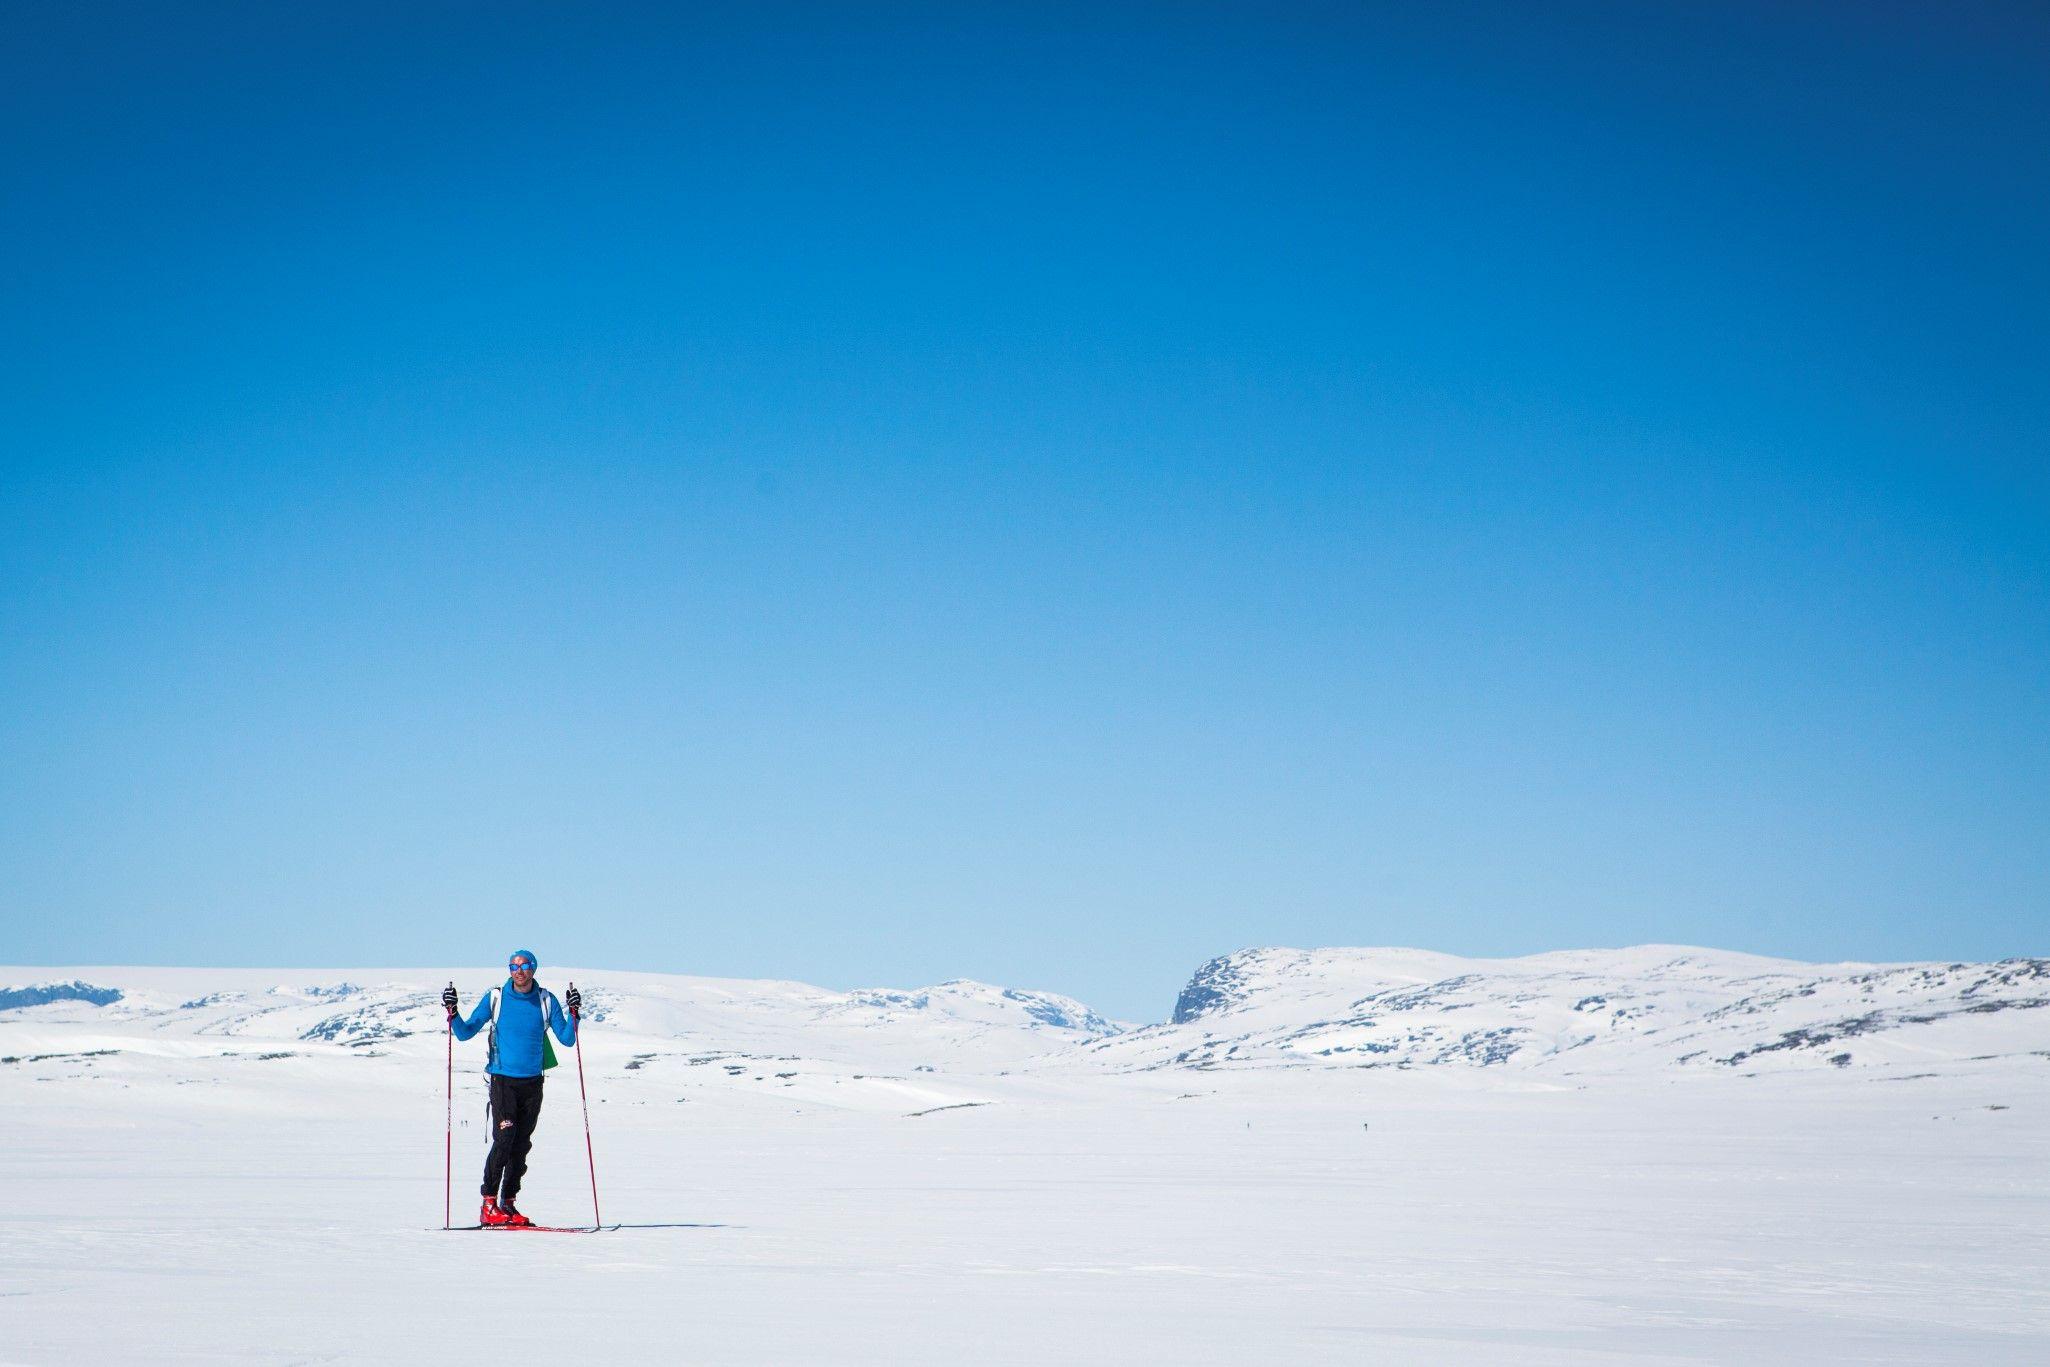 Kvinne på ski i skiløypa Ustedalsfjorden Rundt på Geilo